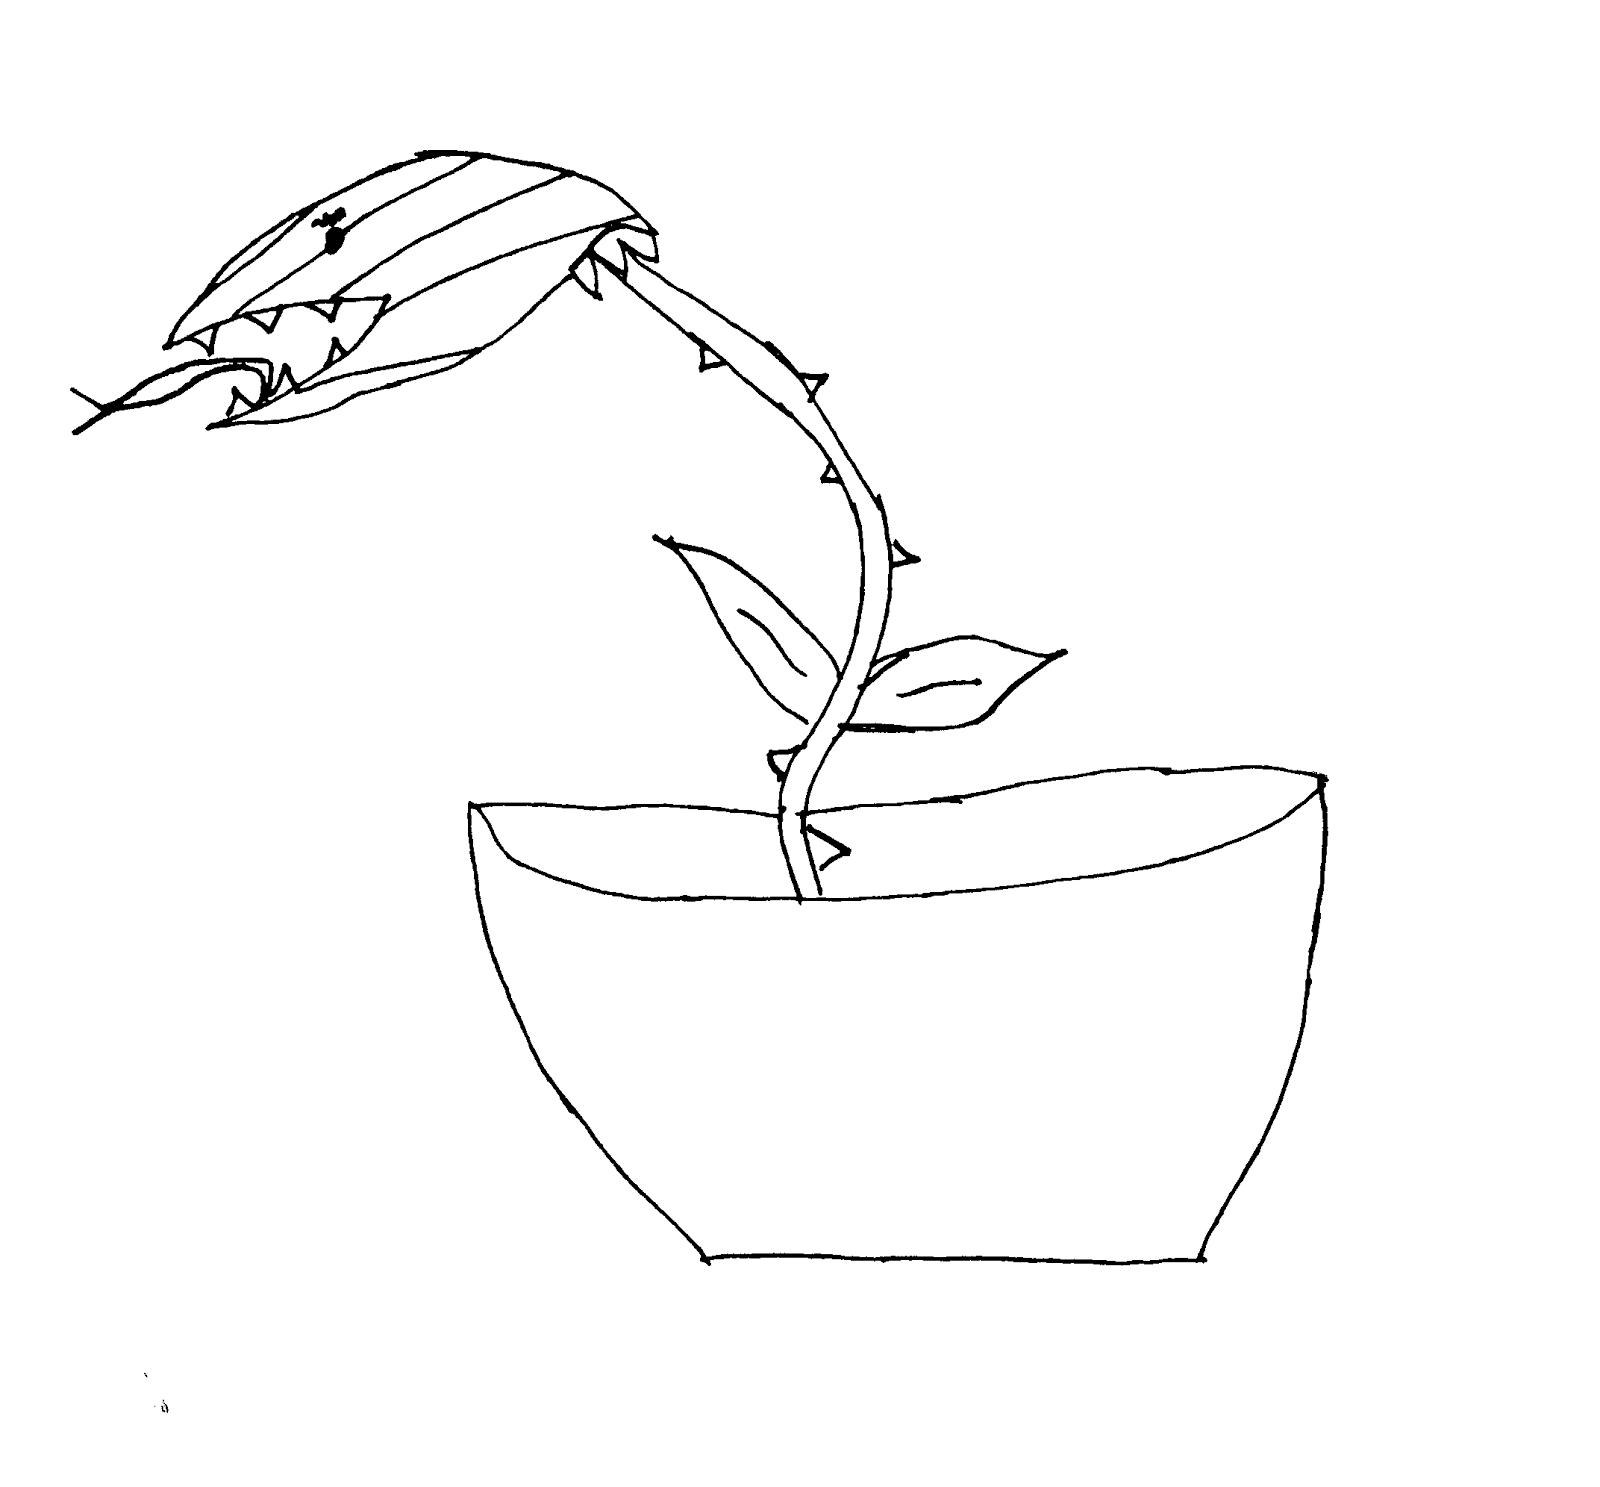 elementari: Il mondo vegetale